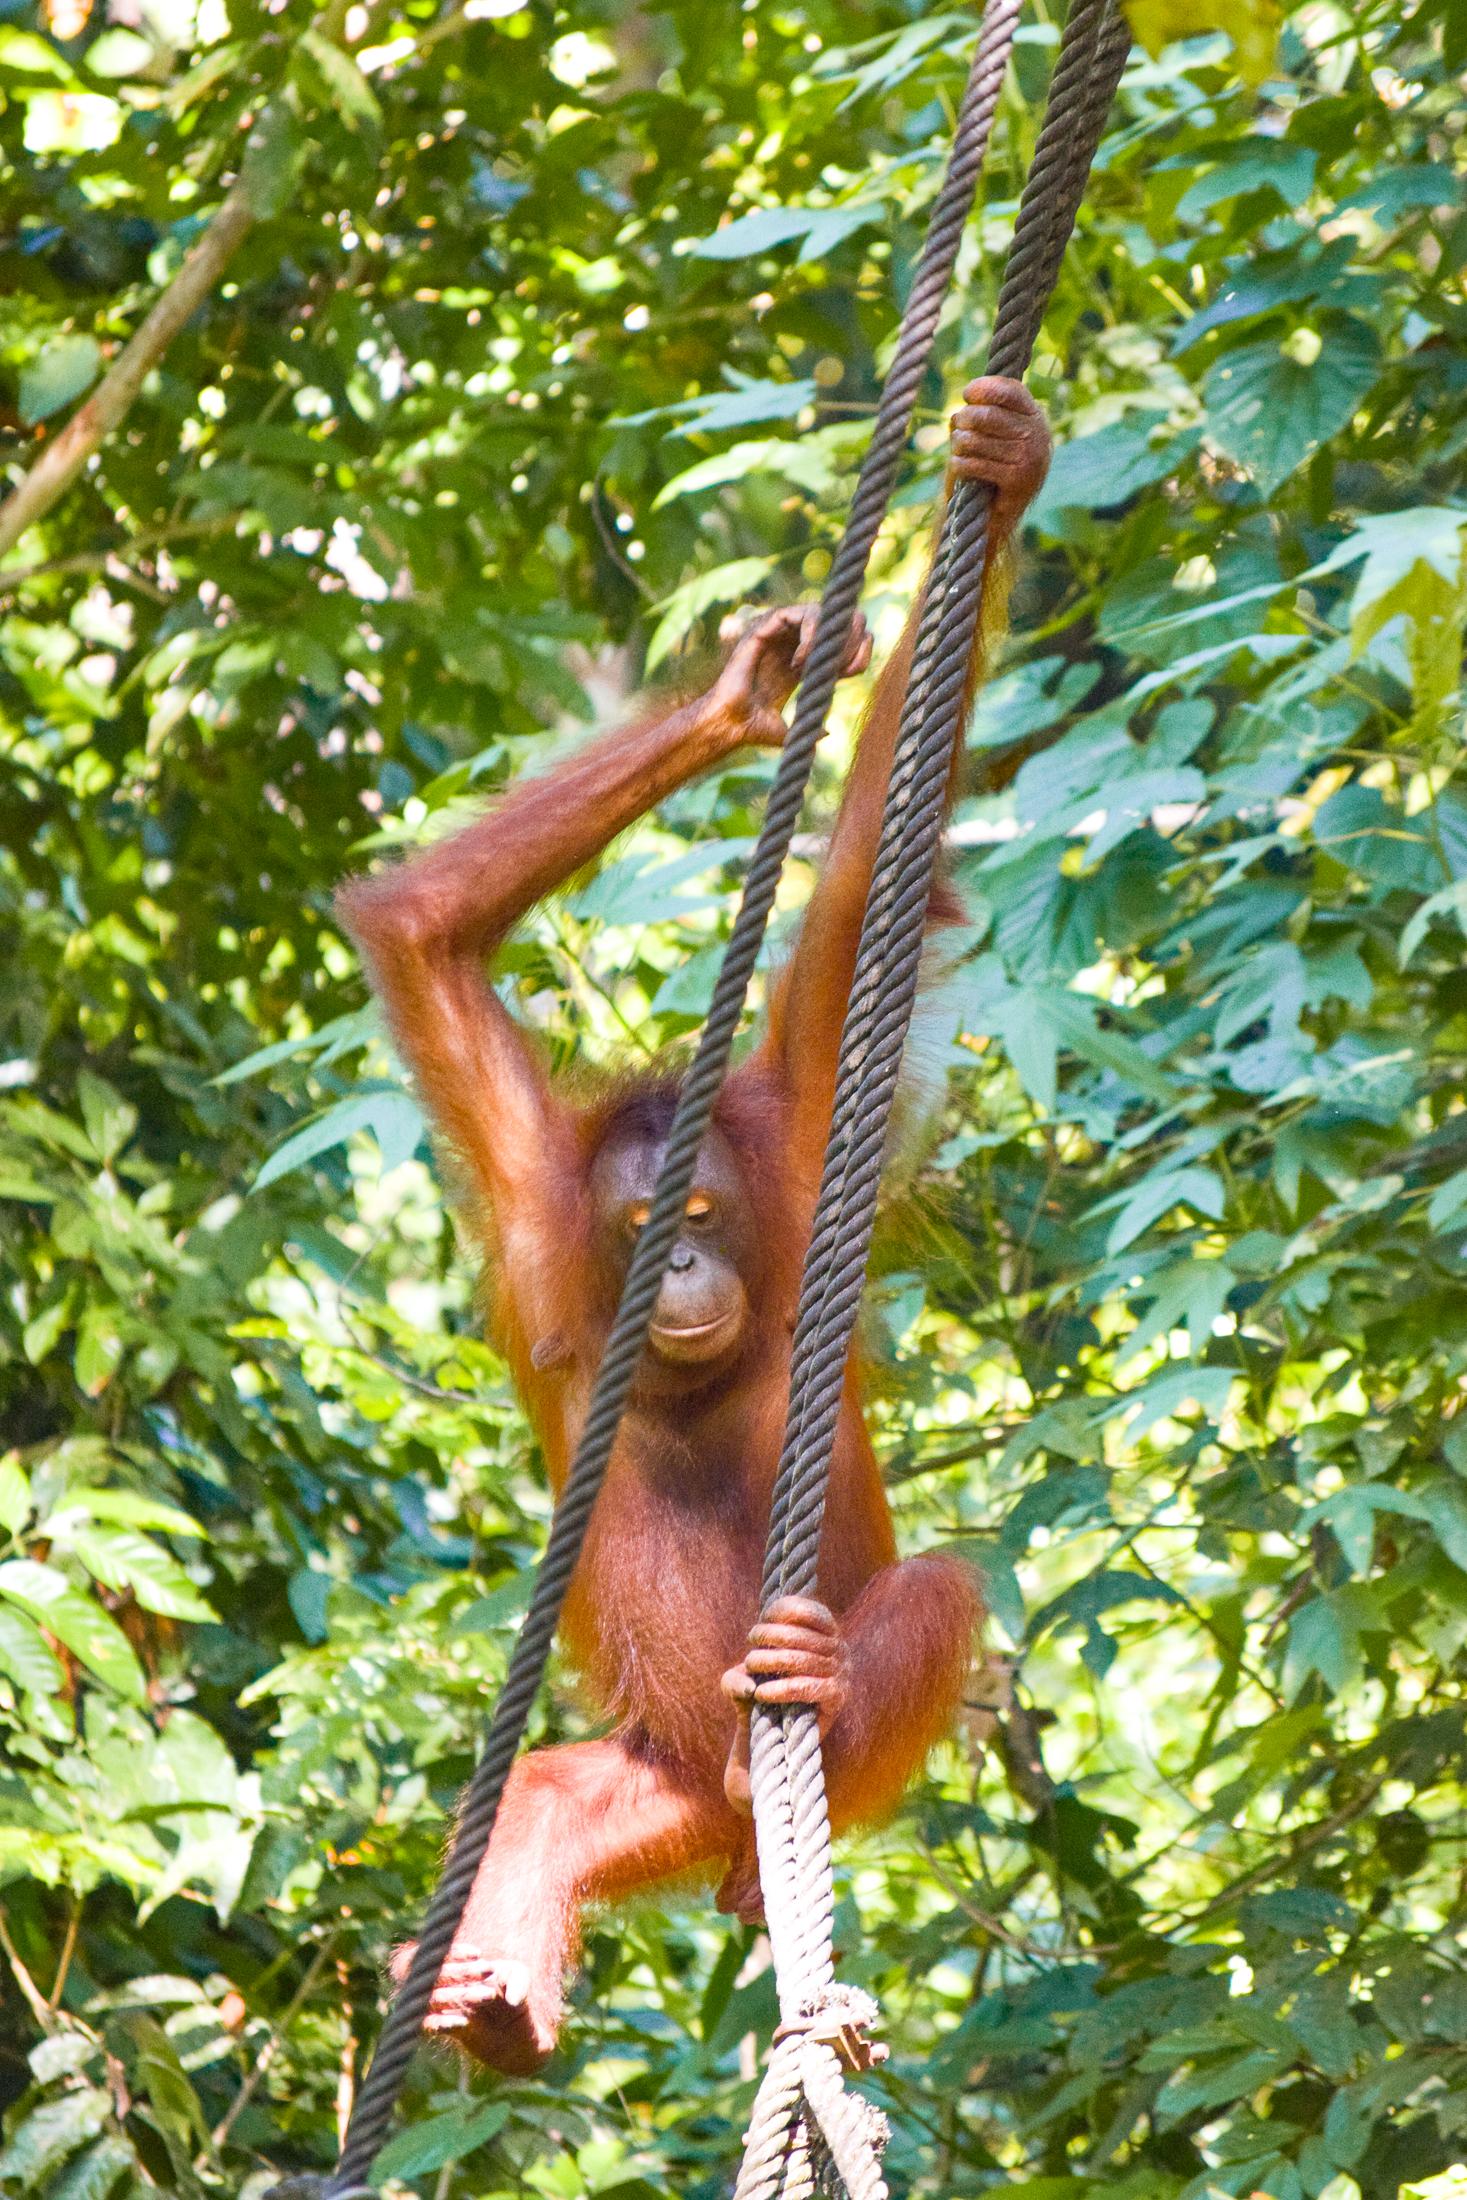 Orangutang svingar sig i ett rep i djungeln.